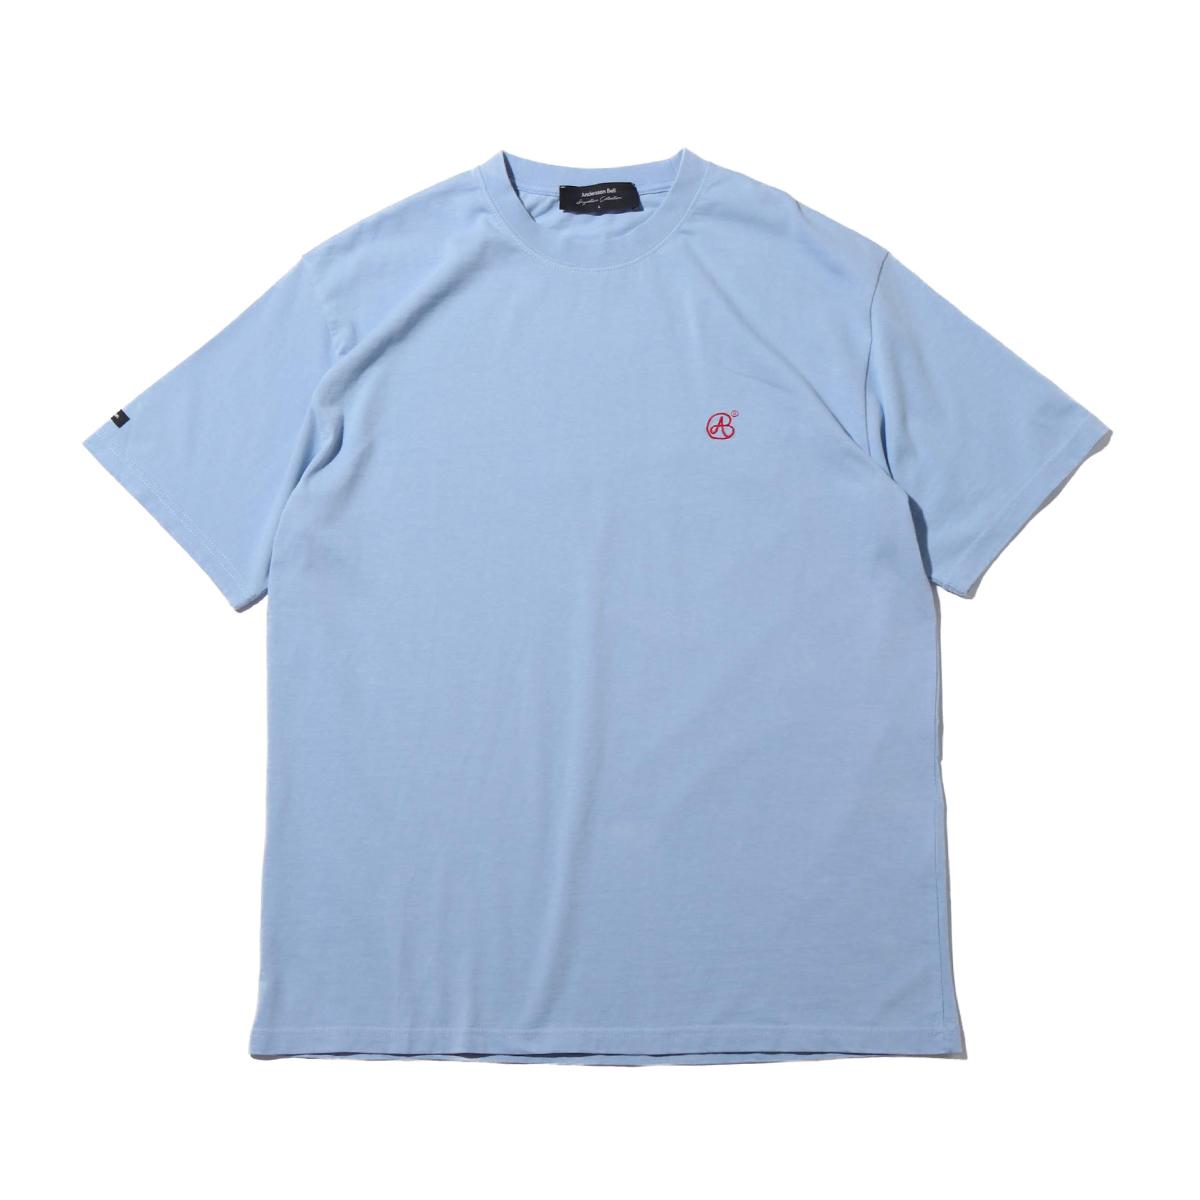 Andersson Bell UNISEX SIGNATURE EMBLEM T-SHIRT(アンダーソンベル シグネチャー エンブレム ティー)BLUE【メンズ レディース 半袖Tシャツ】19SU-I